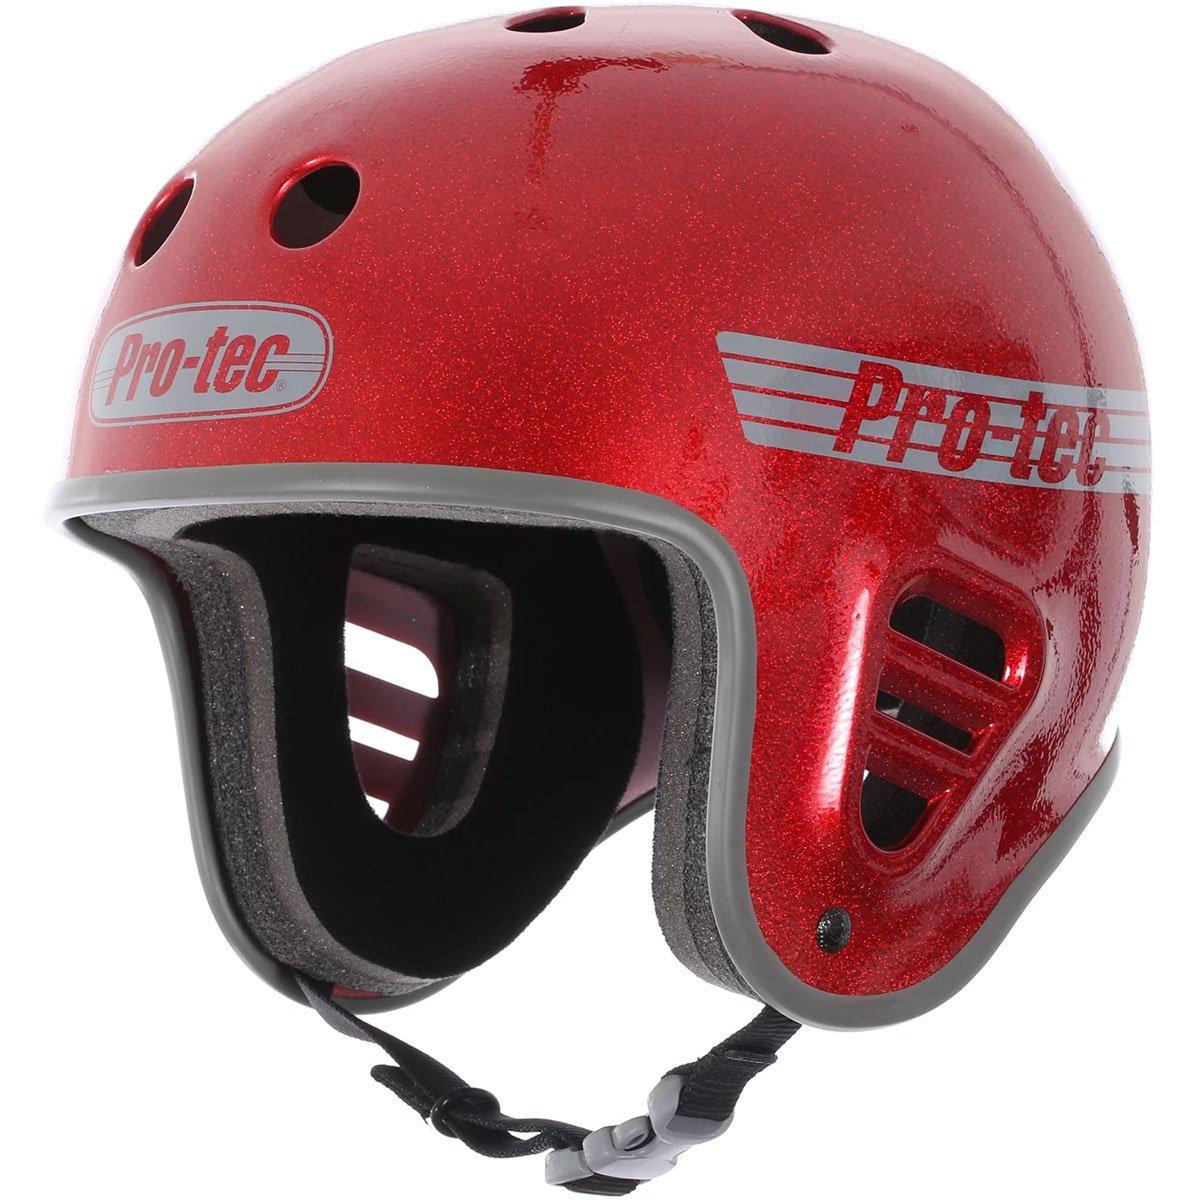 Pro Tec Full Cut Skate Helmet - Red Metal Flake - MD